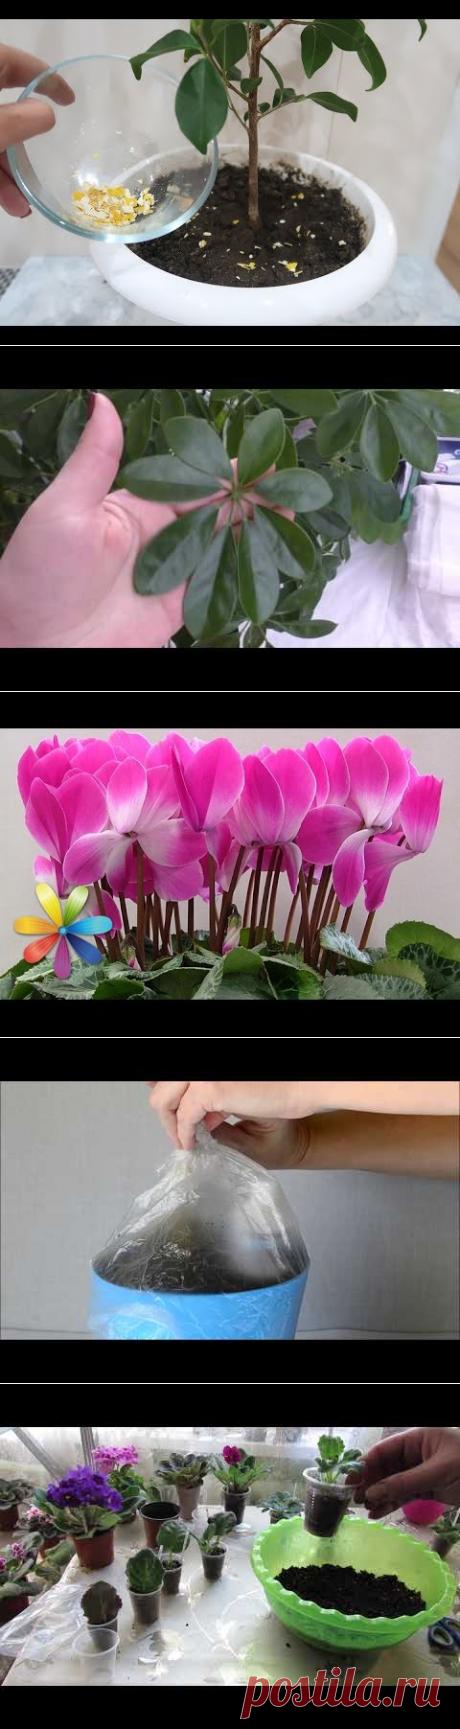 (913) 6 НЕОБЫЧНЫХ УДОБРЕНИЙ для комнатных цветов - YouTube